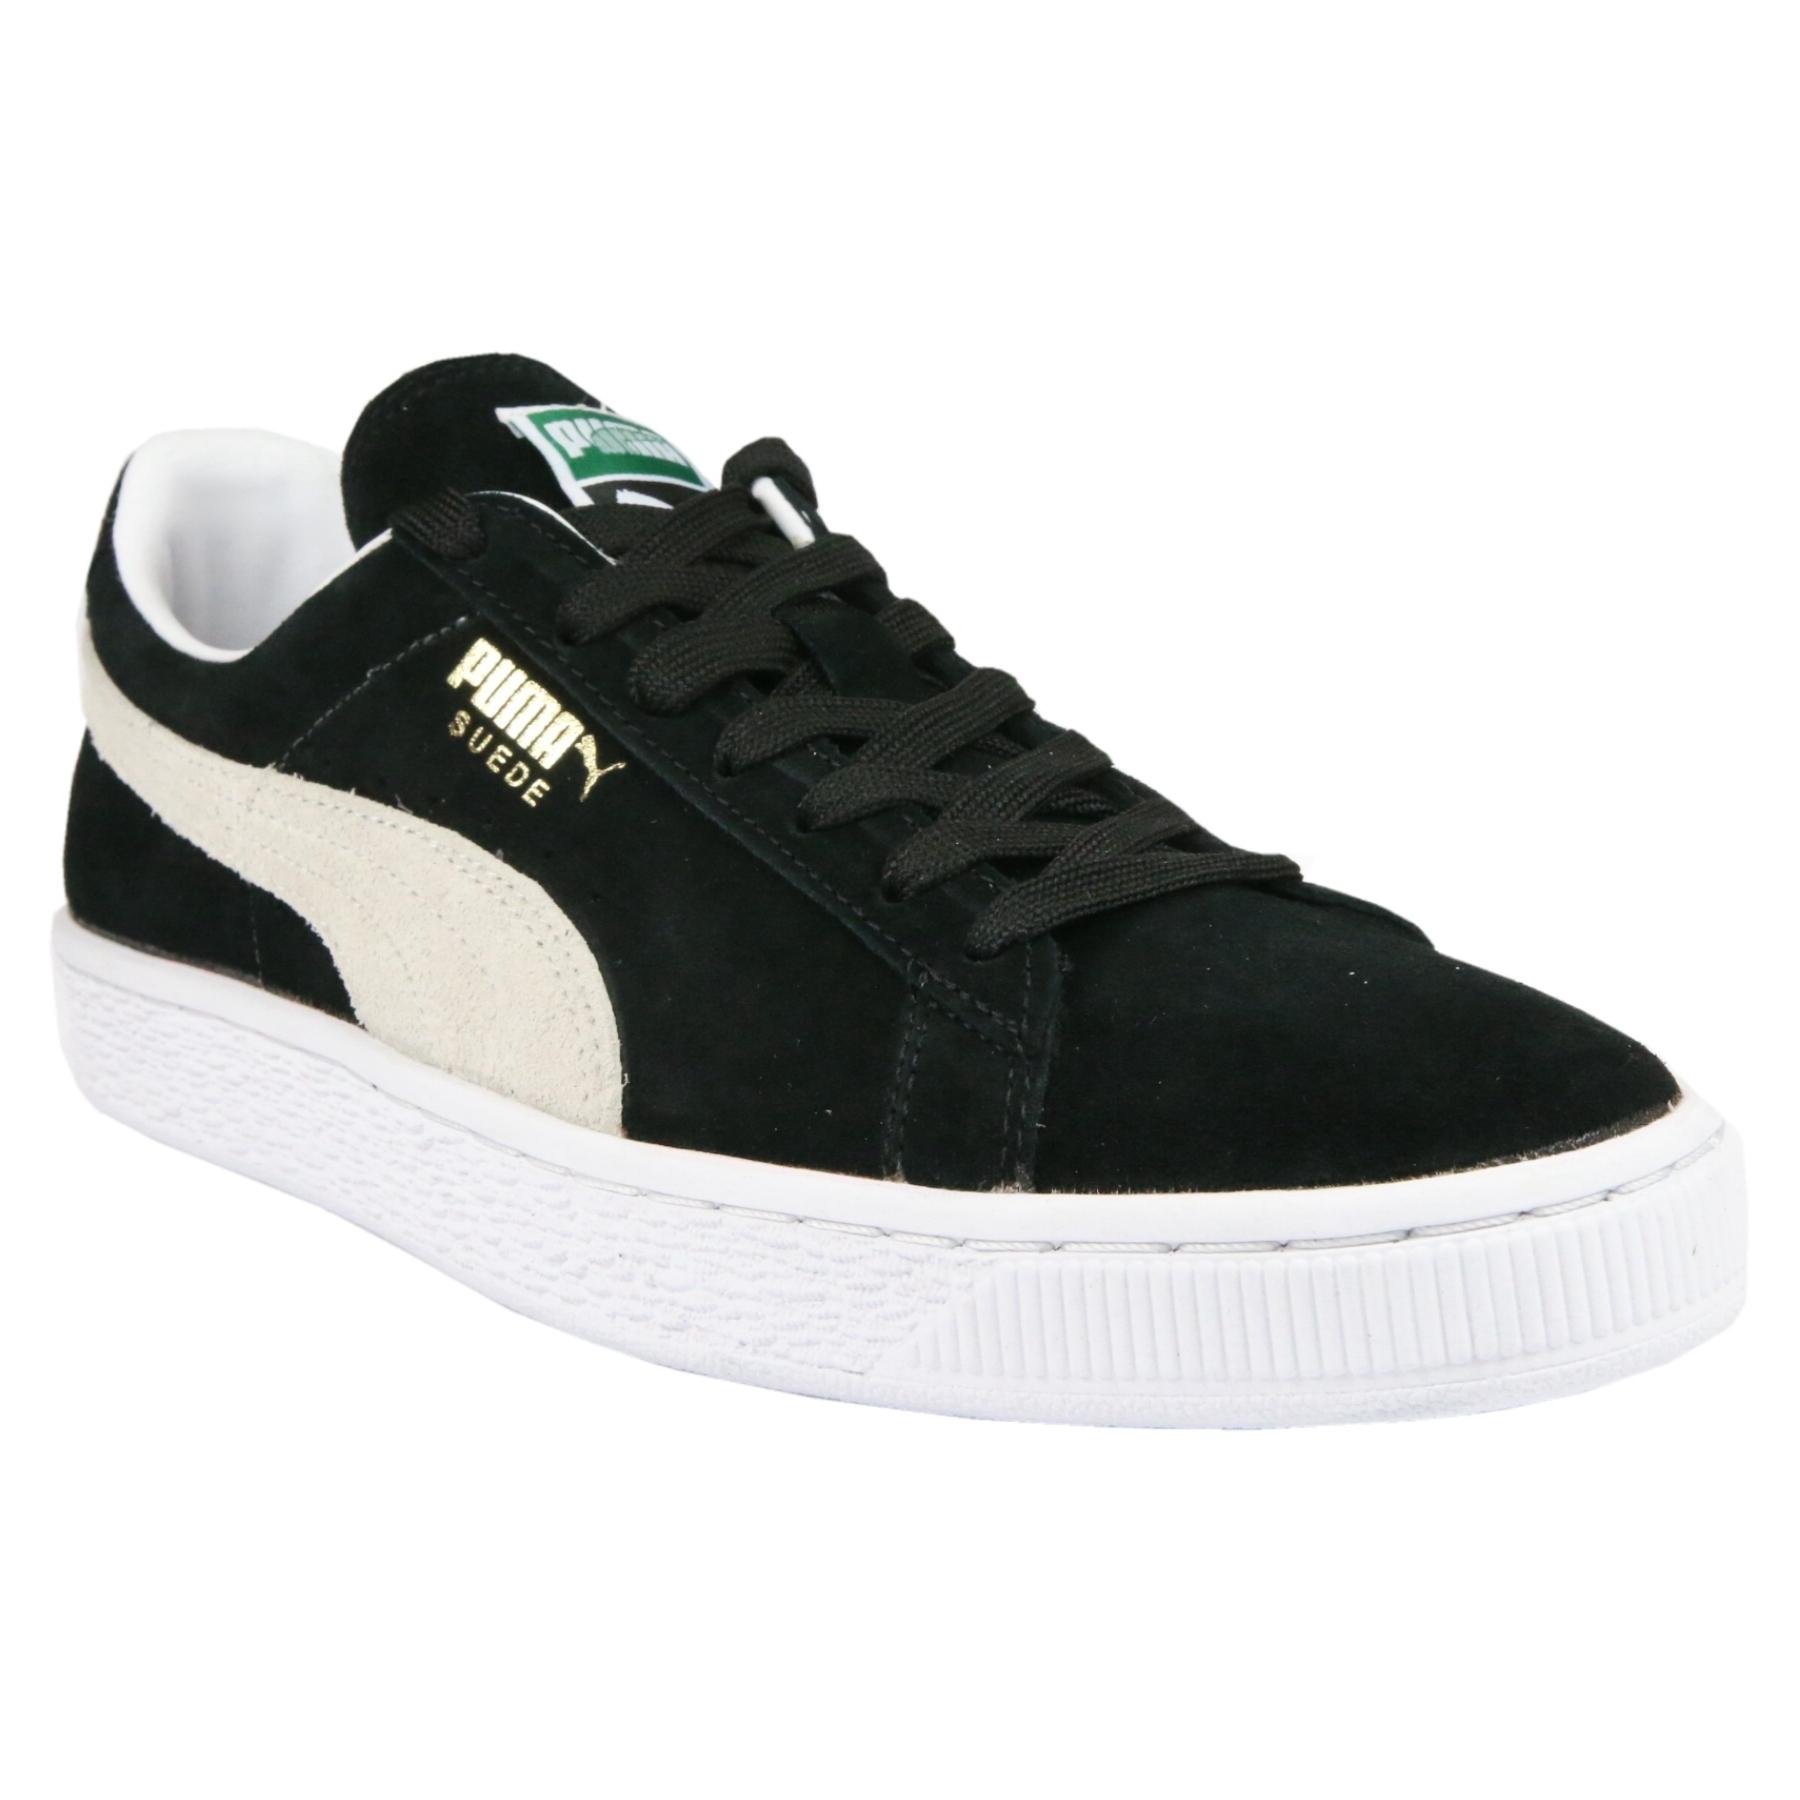 PUMA-Suede-Classic-Scarpe-Da-Ginnastica-Sneaker-Camoscio-Donna-Uomo